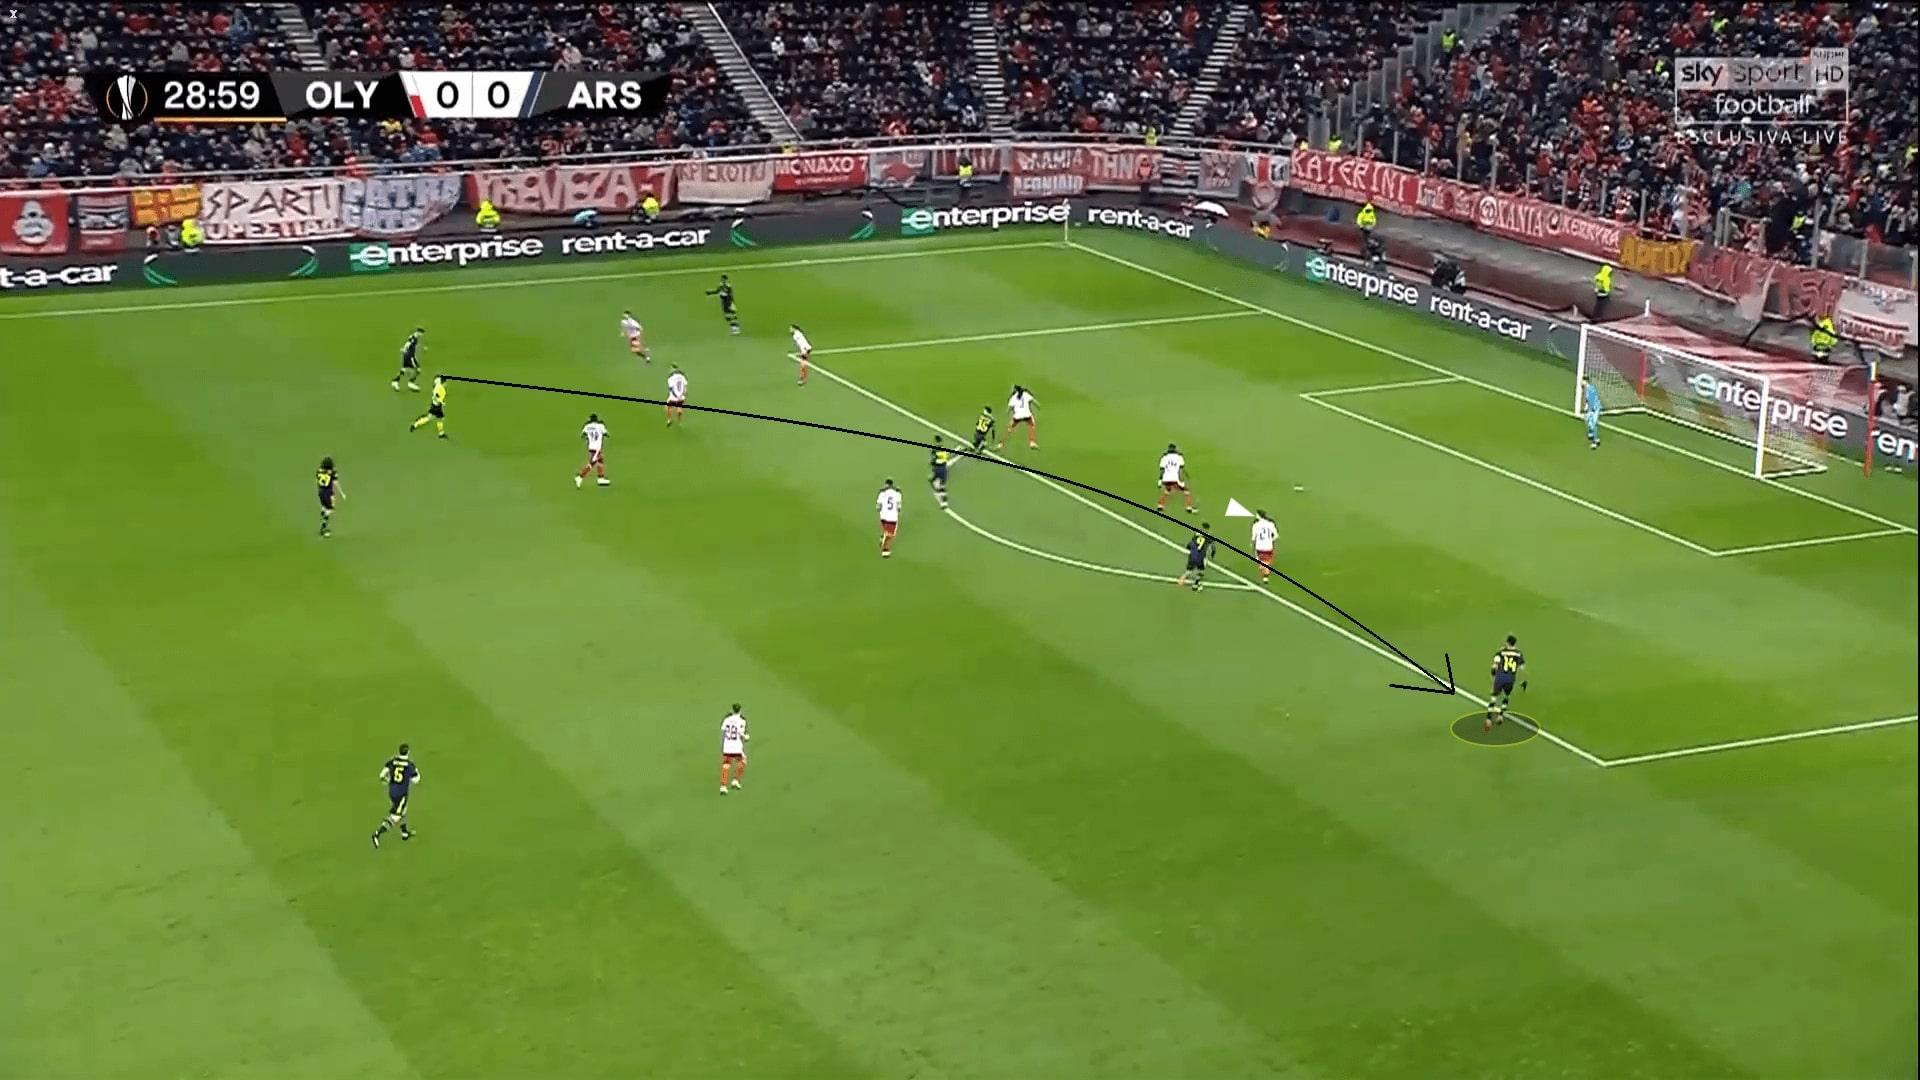 Pierre-Emerick Aubameyang under Mikel Arteta 2019/20 - scout report - tactical analysis tactics